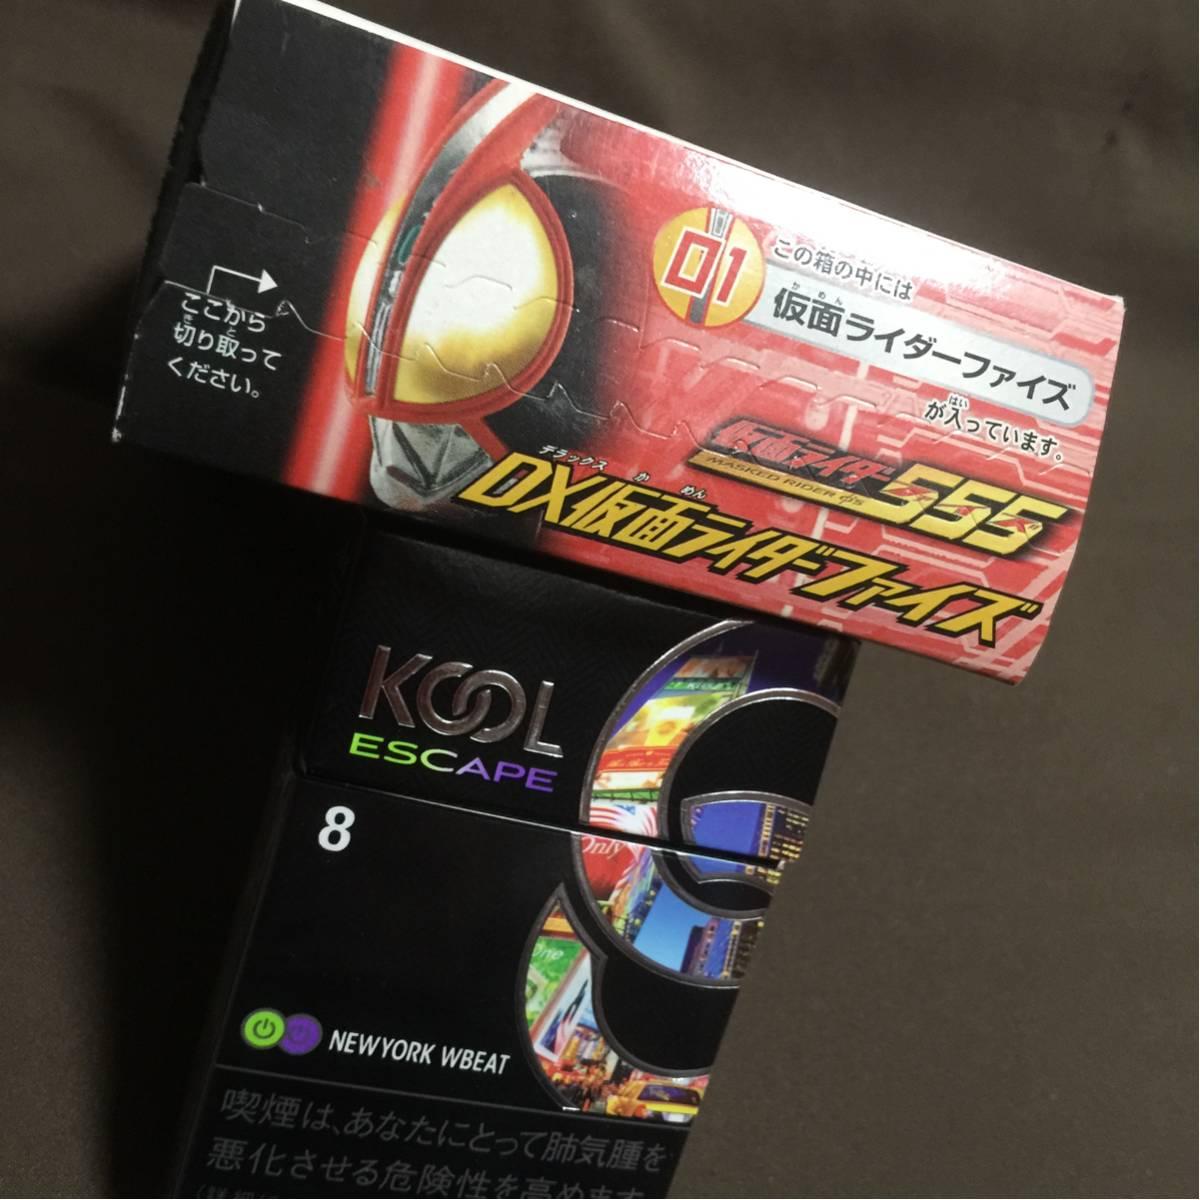 DX仮面ライダーファイズ[①]2003年当時物《未開封保管品《現状現品渡し》バンダイ_画像2